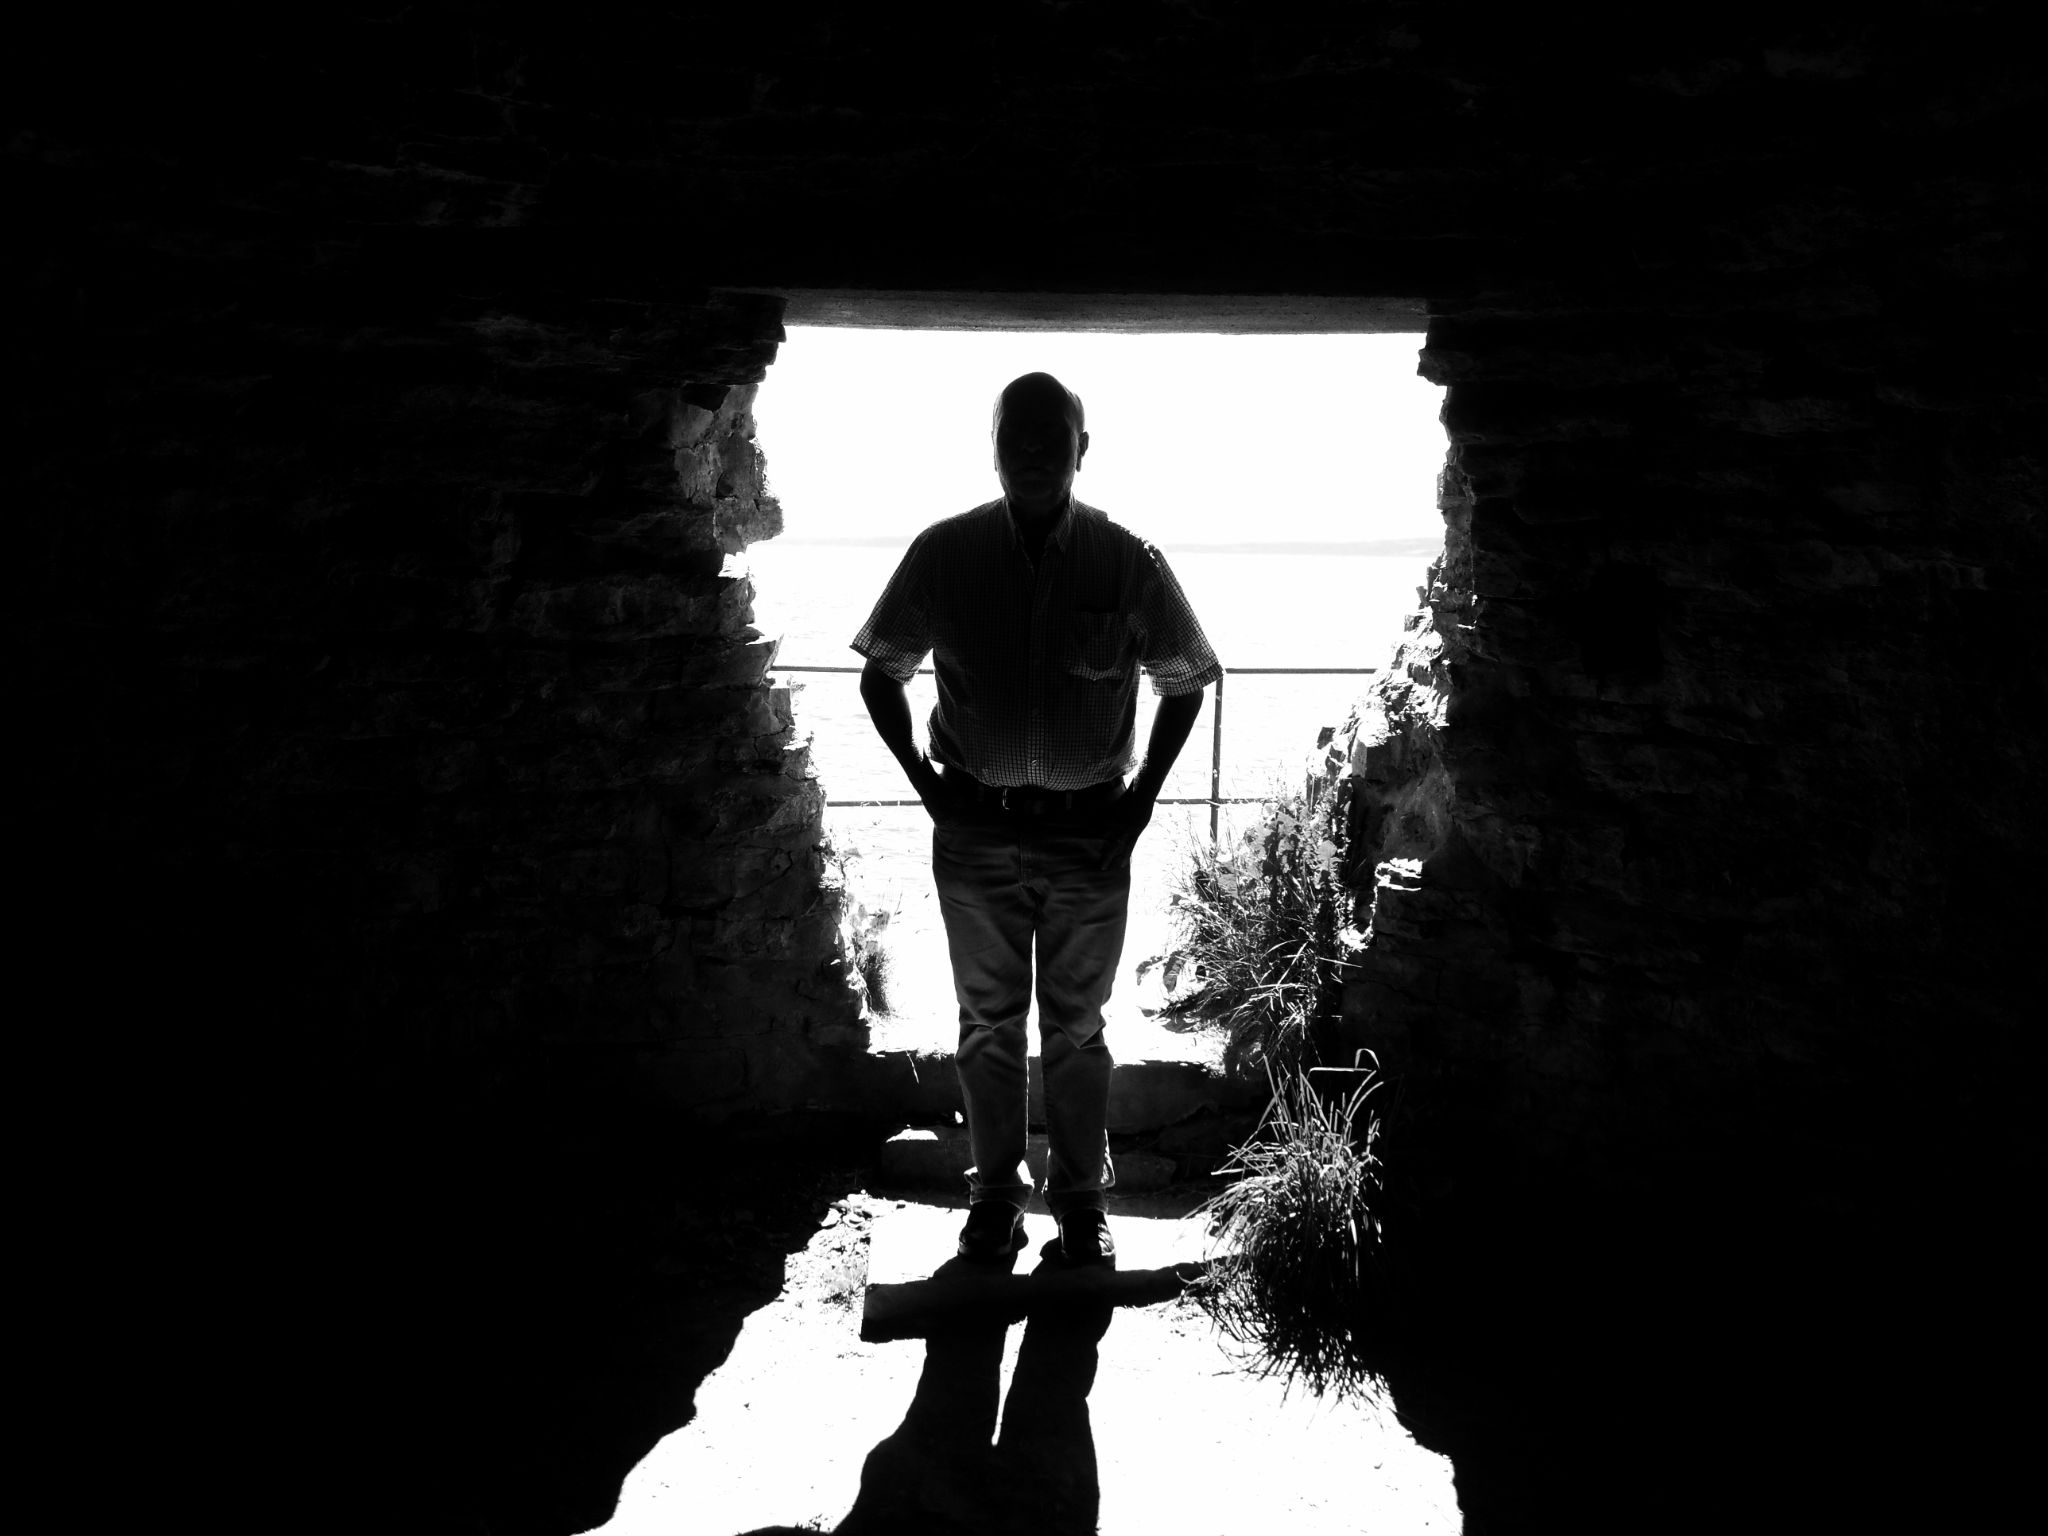 silhouette by monanorrman